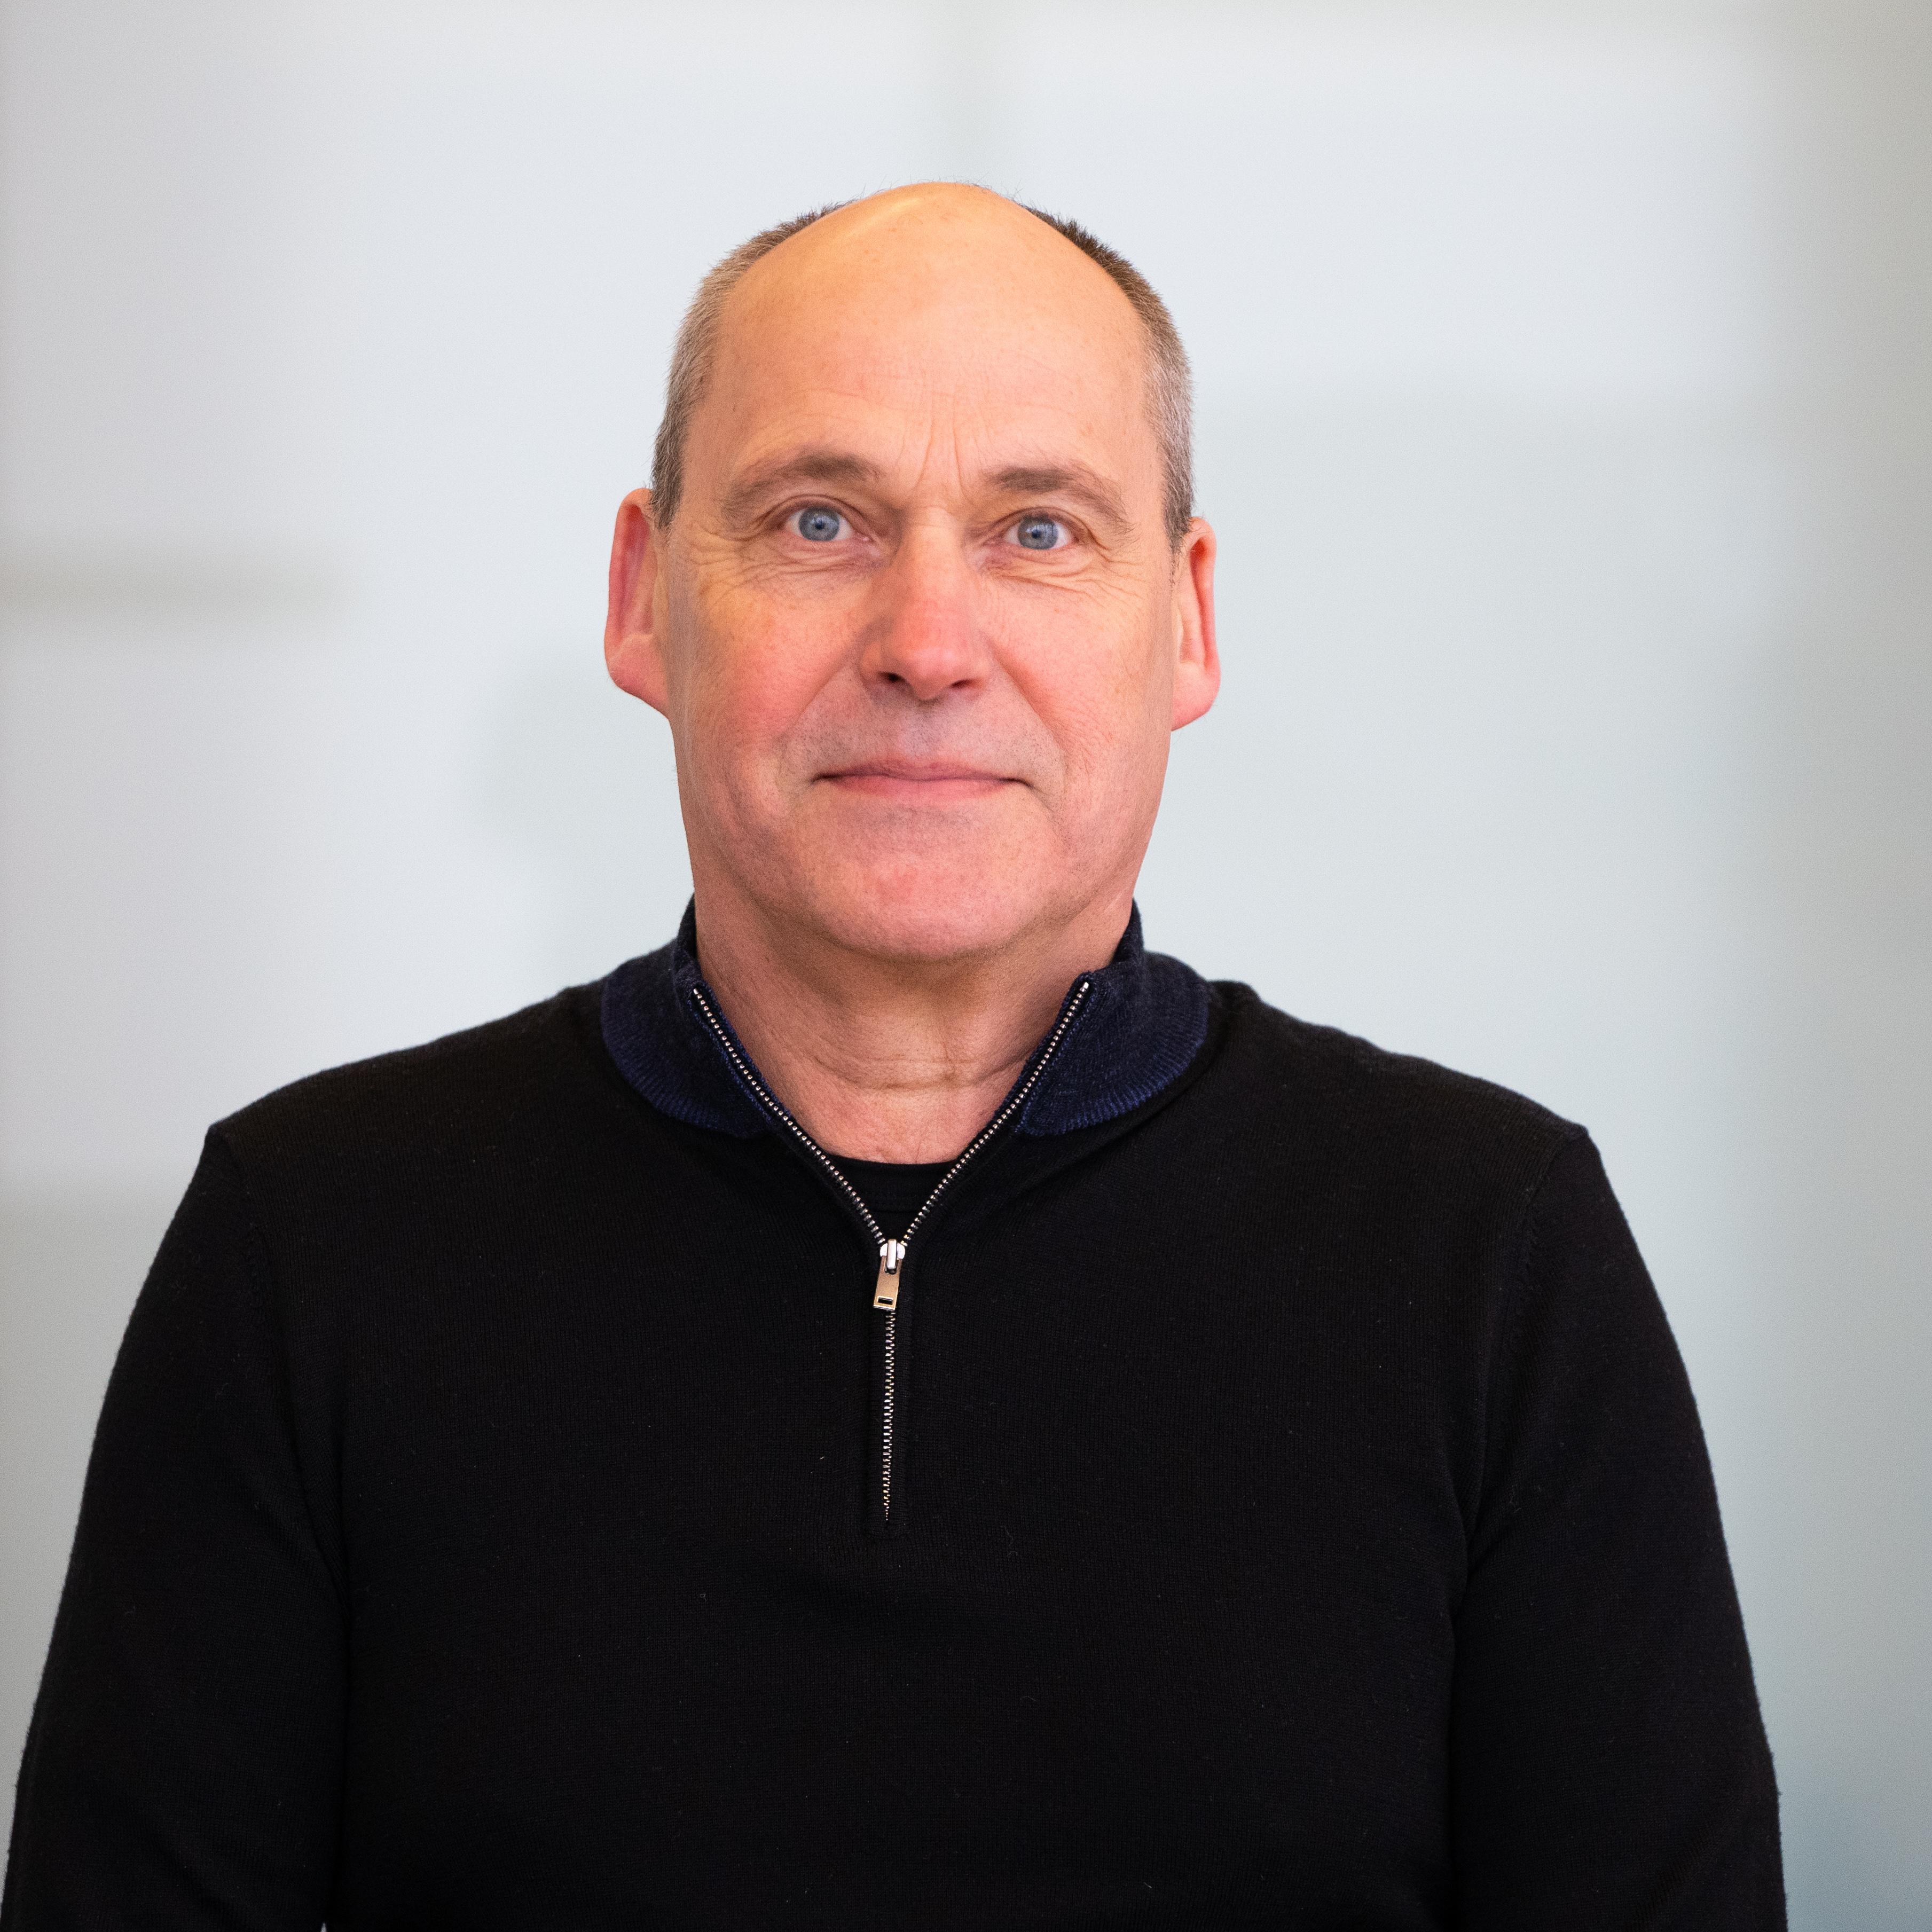 Professor Frank Flury